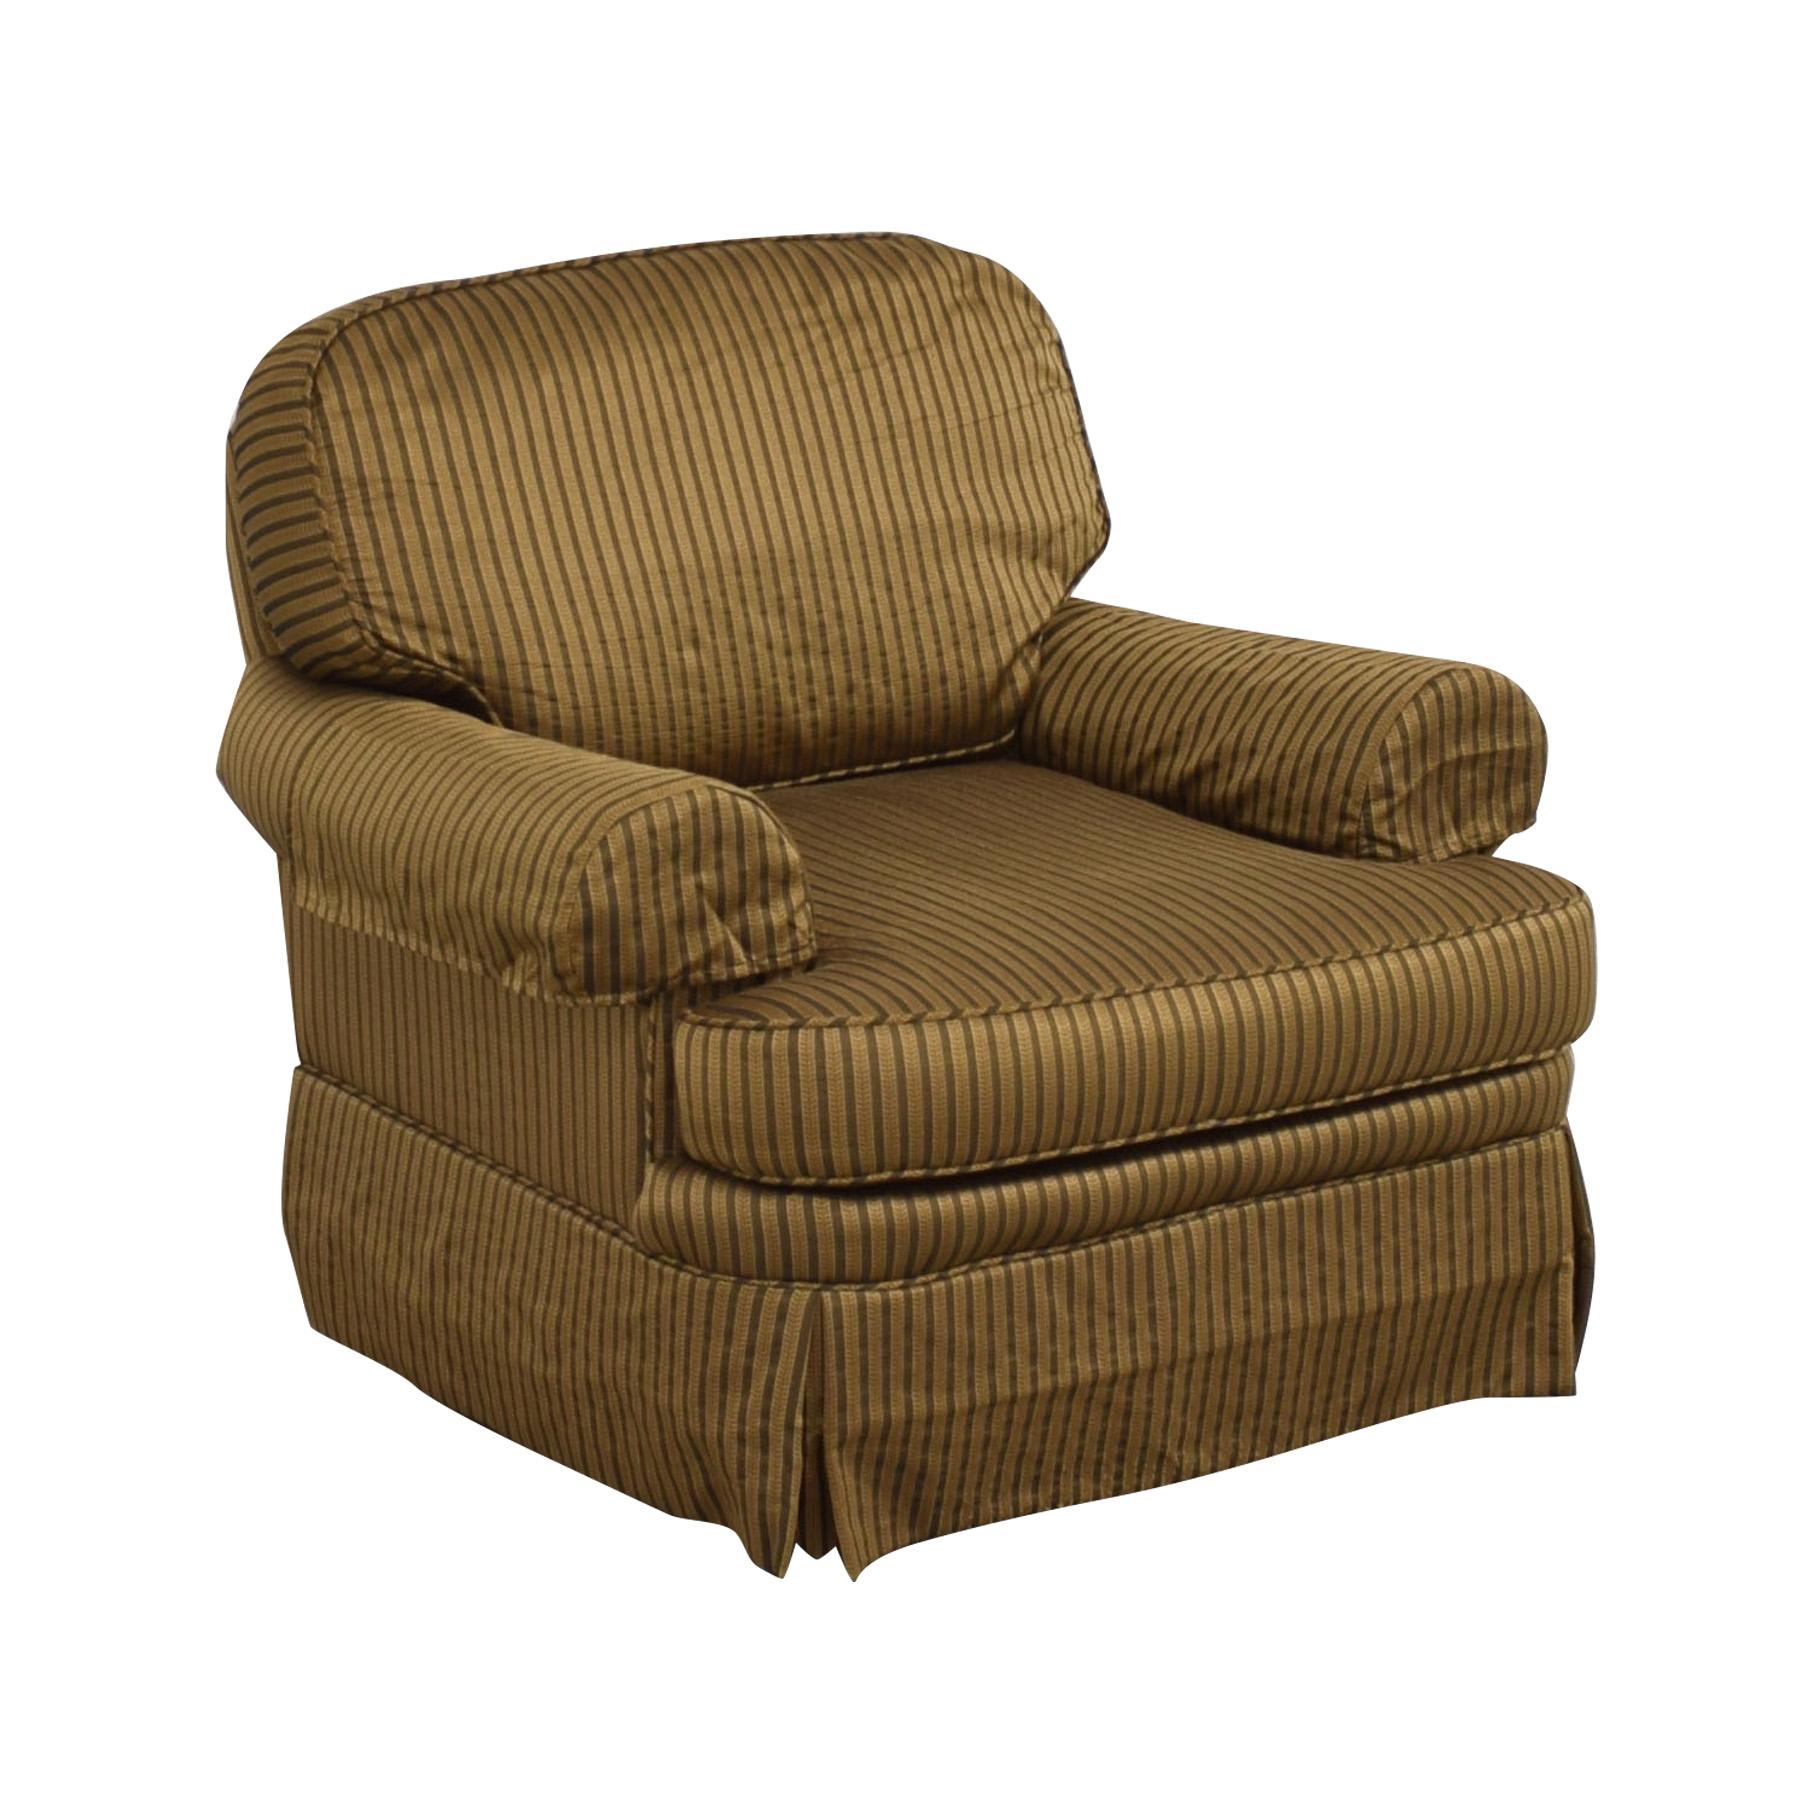 Woodmark Swivel Chair sale